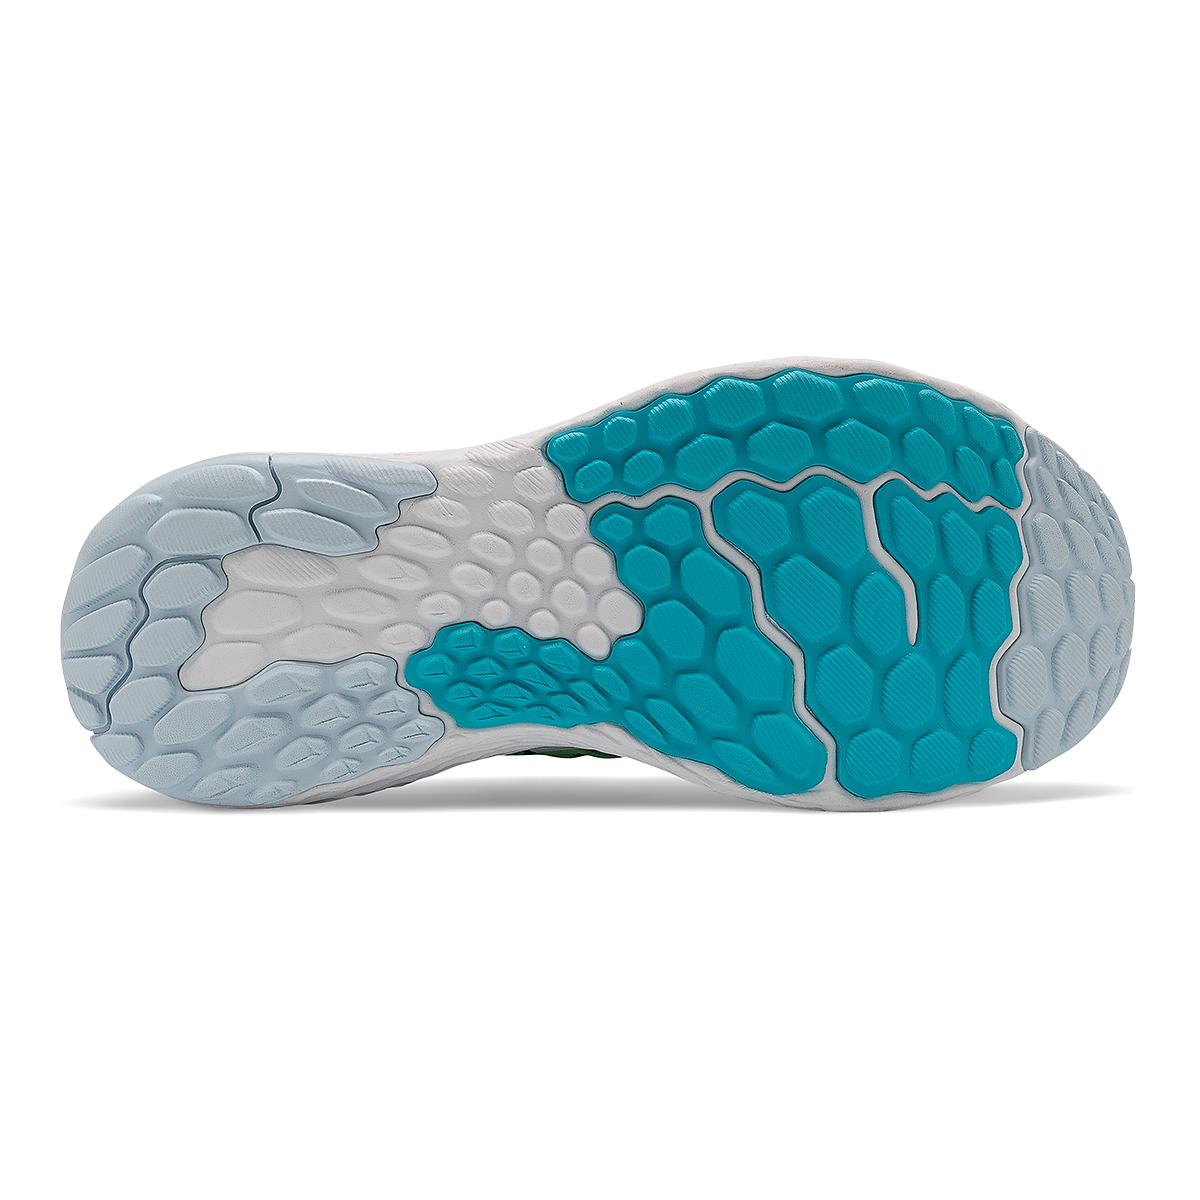 Women's New Balance Fresh Foam 1080v11 Running Shoe - Color: Virtual Sky/Bleached Lime Glo - Size: 5 - Width: Narrow, Virtual Sky/Bleached Lime Glo, large, image 5